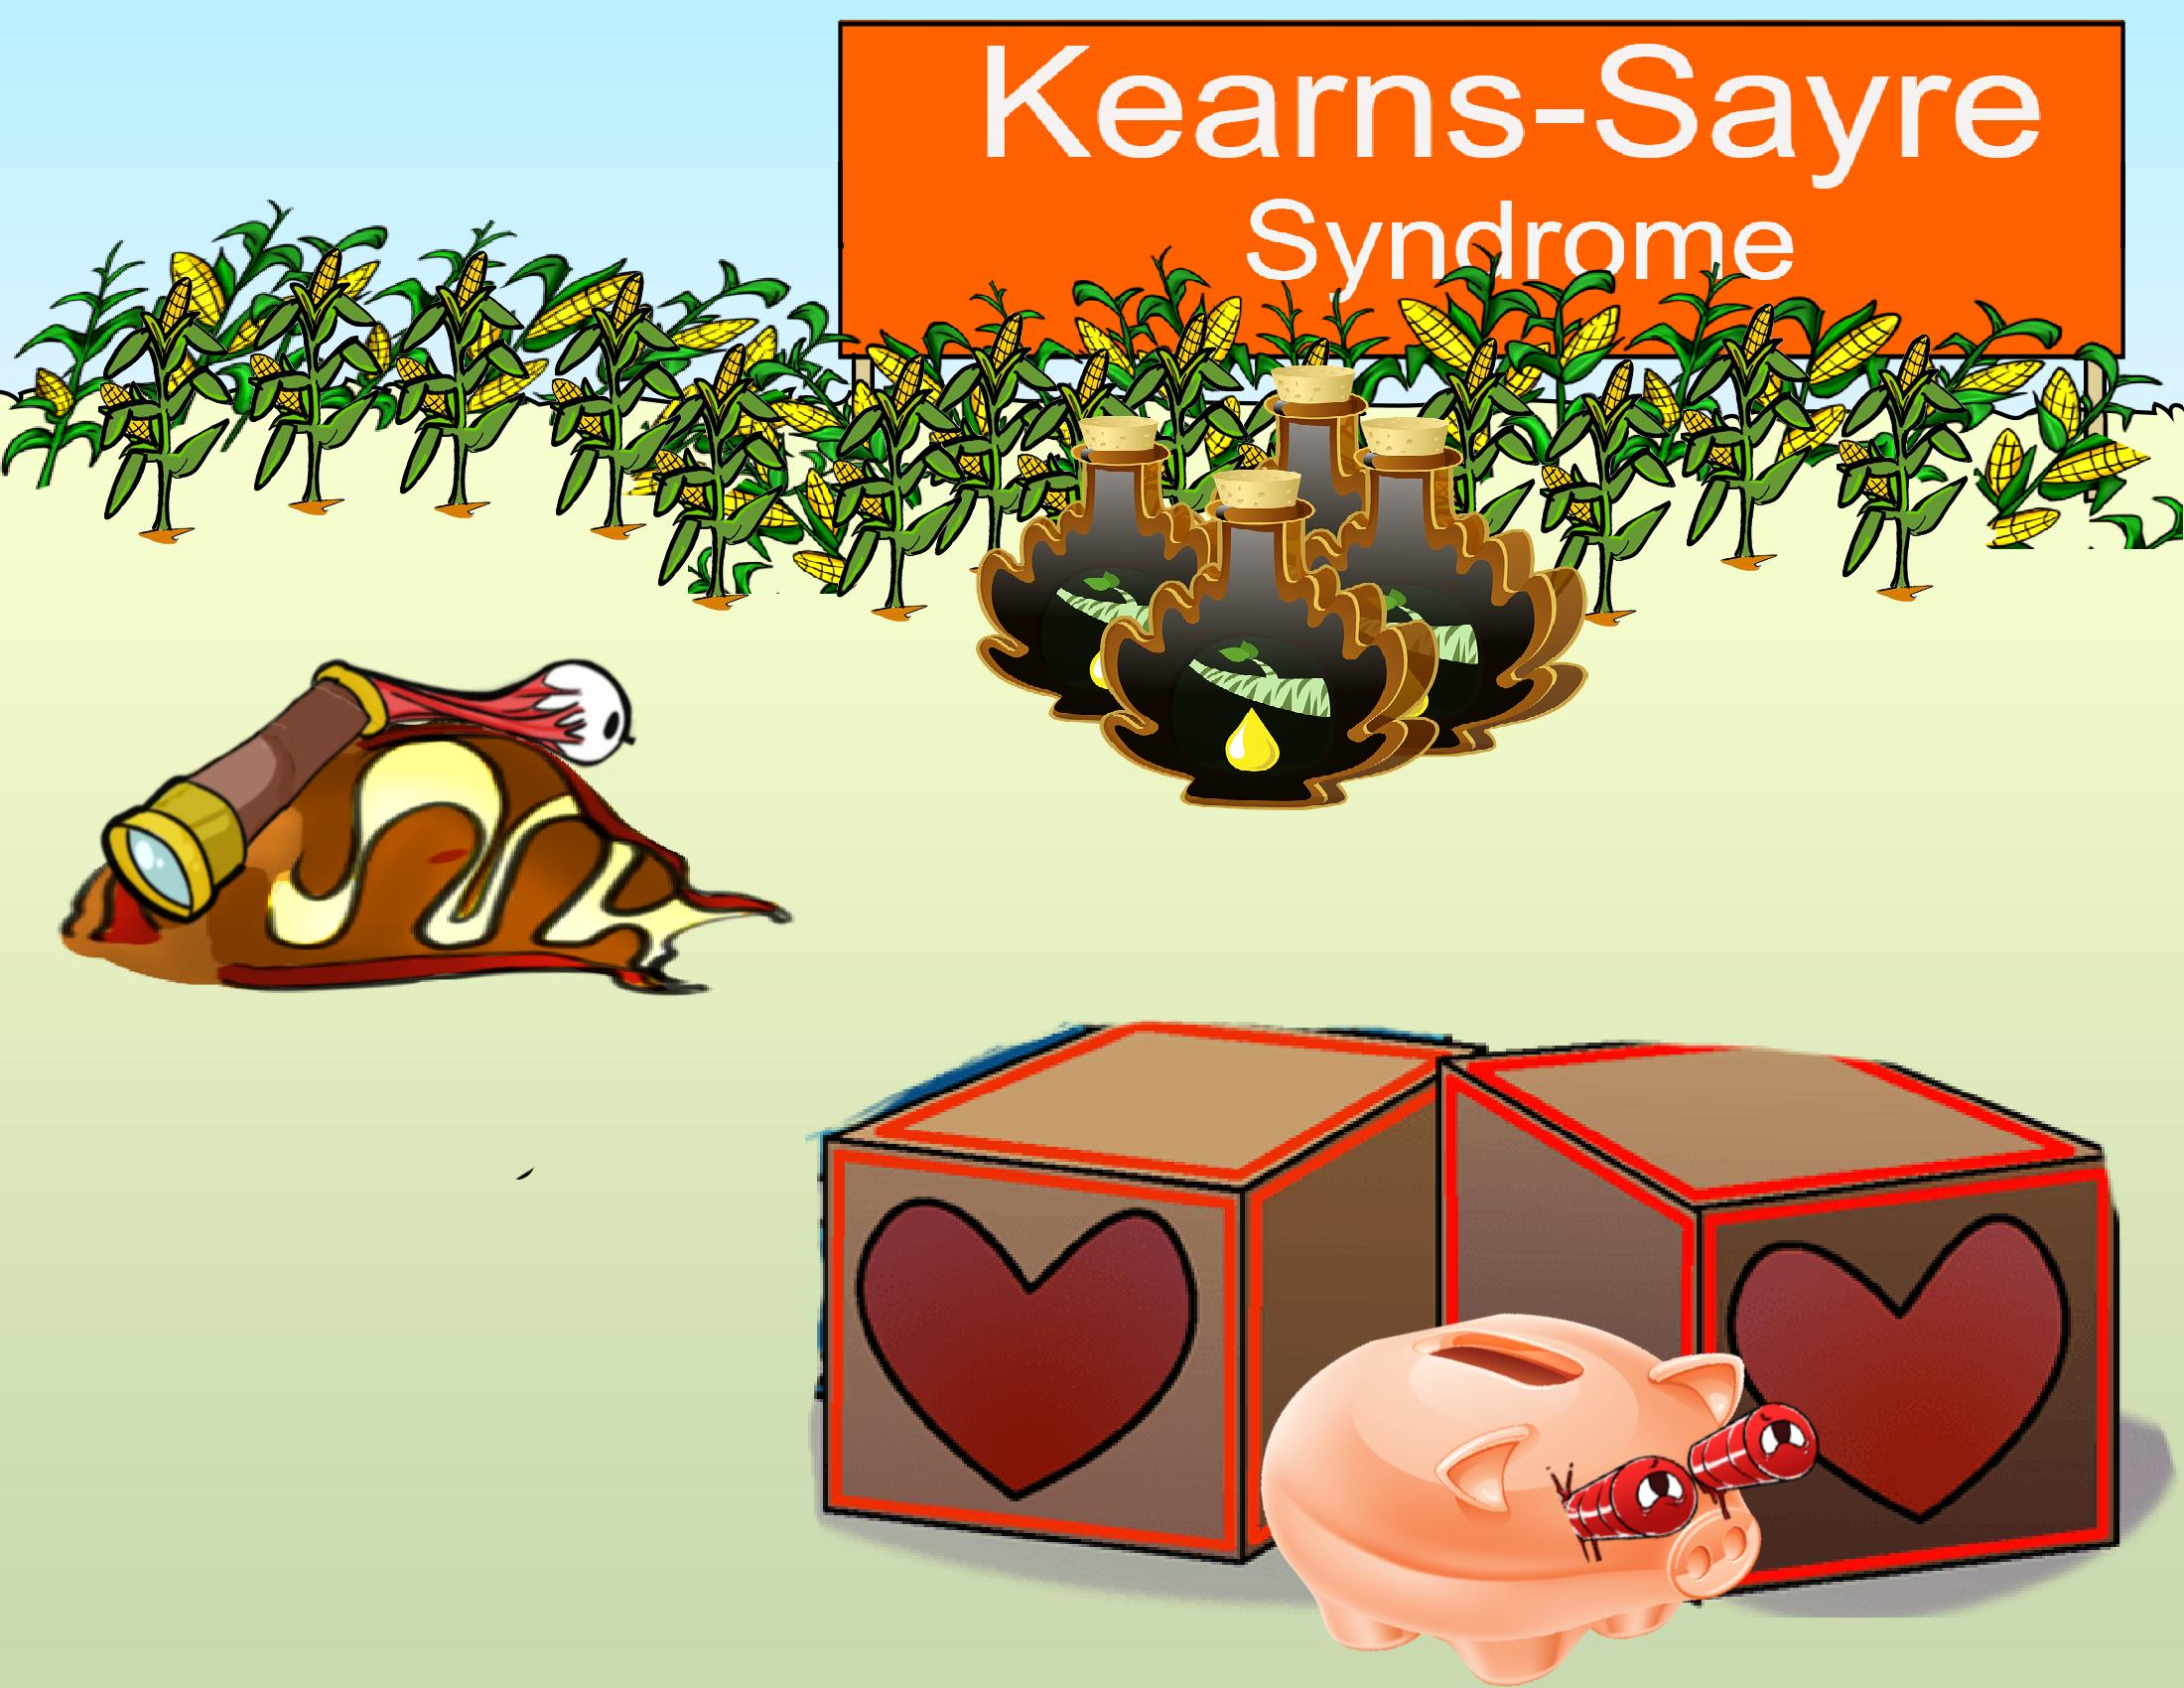 Kearns-Sayre Syndrome